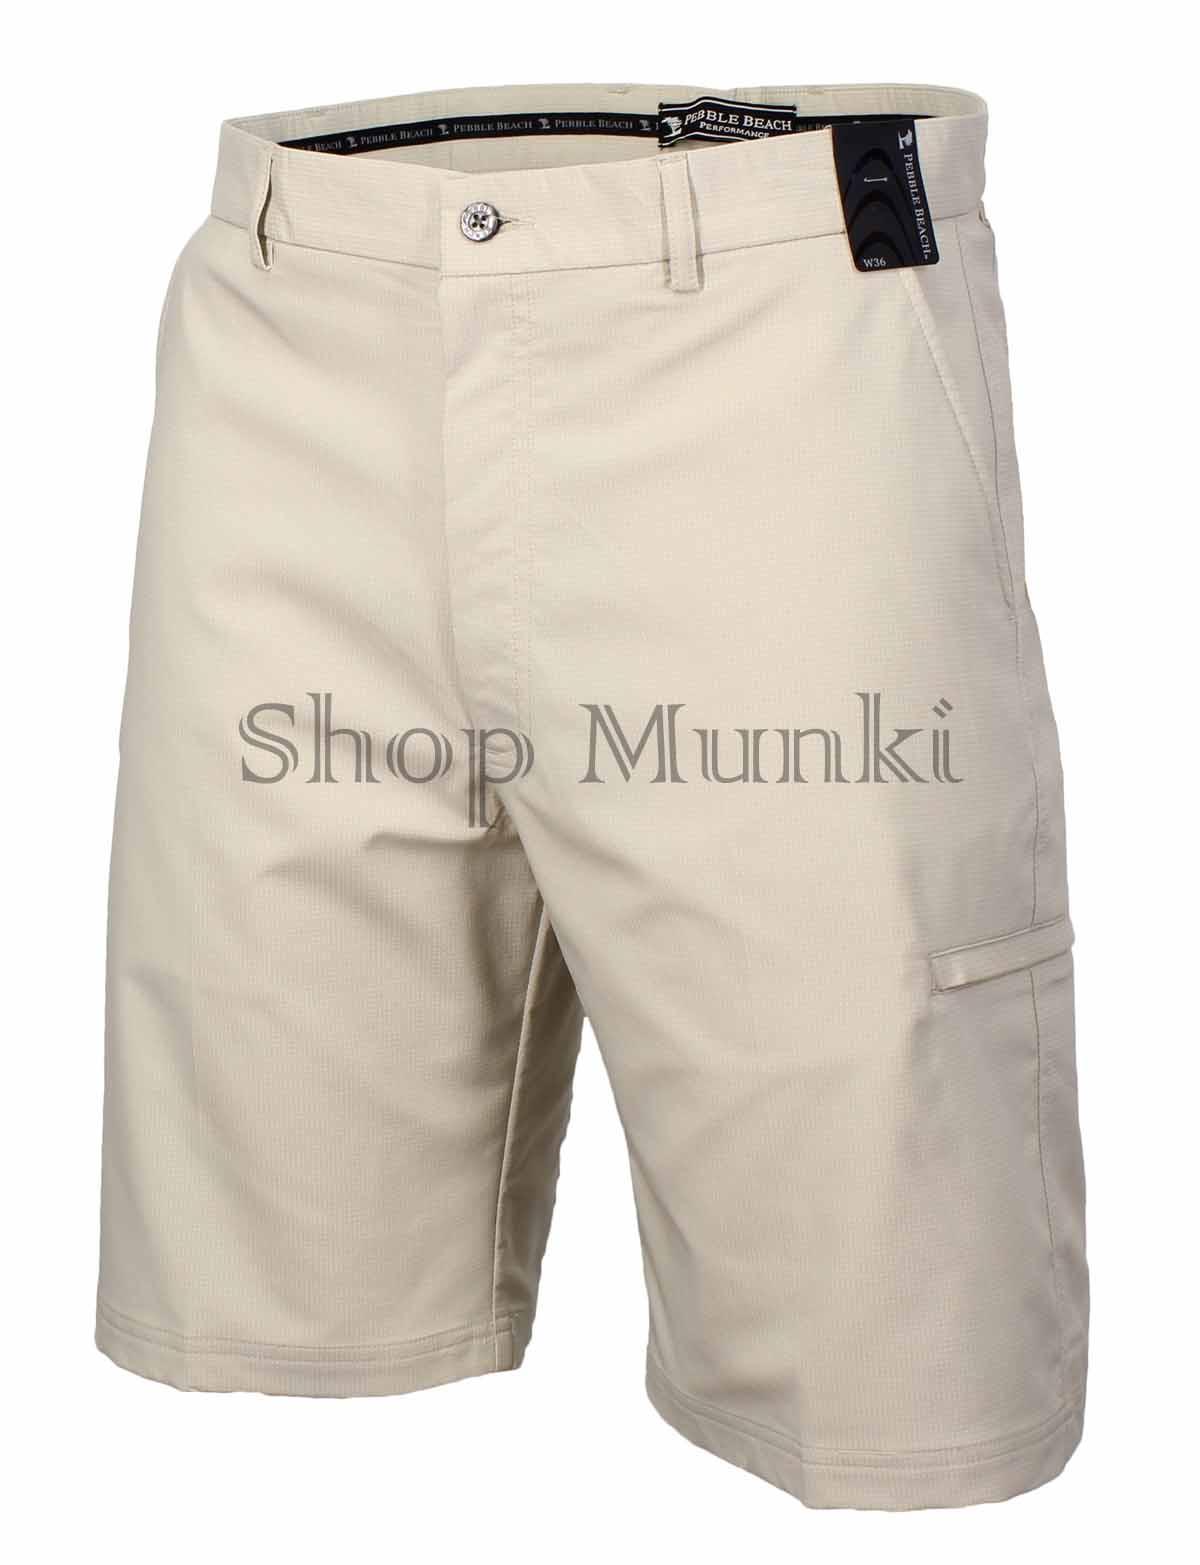 Pebble beach mens performance flat front golf shorts ebay for Pebble beach performance golf shirt